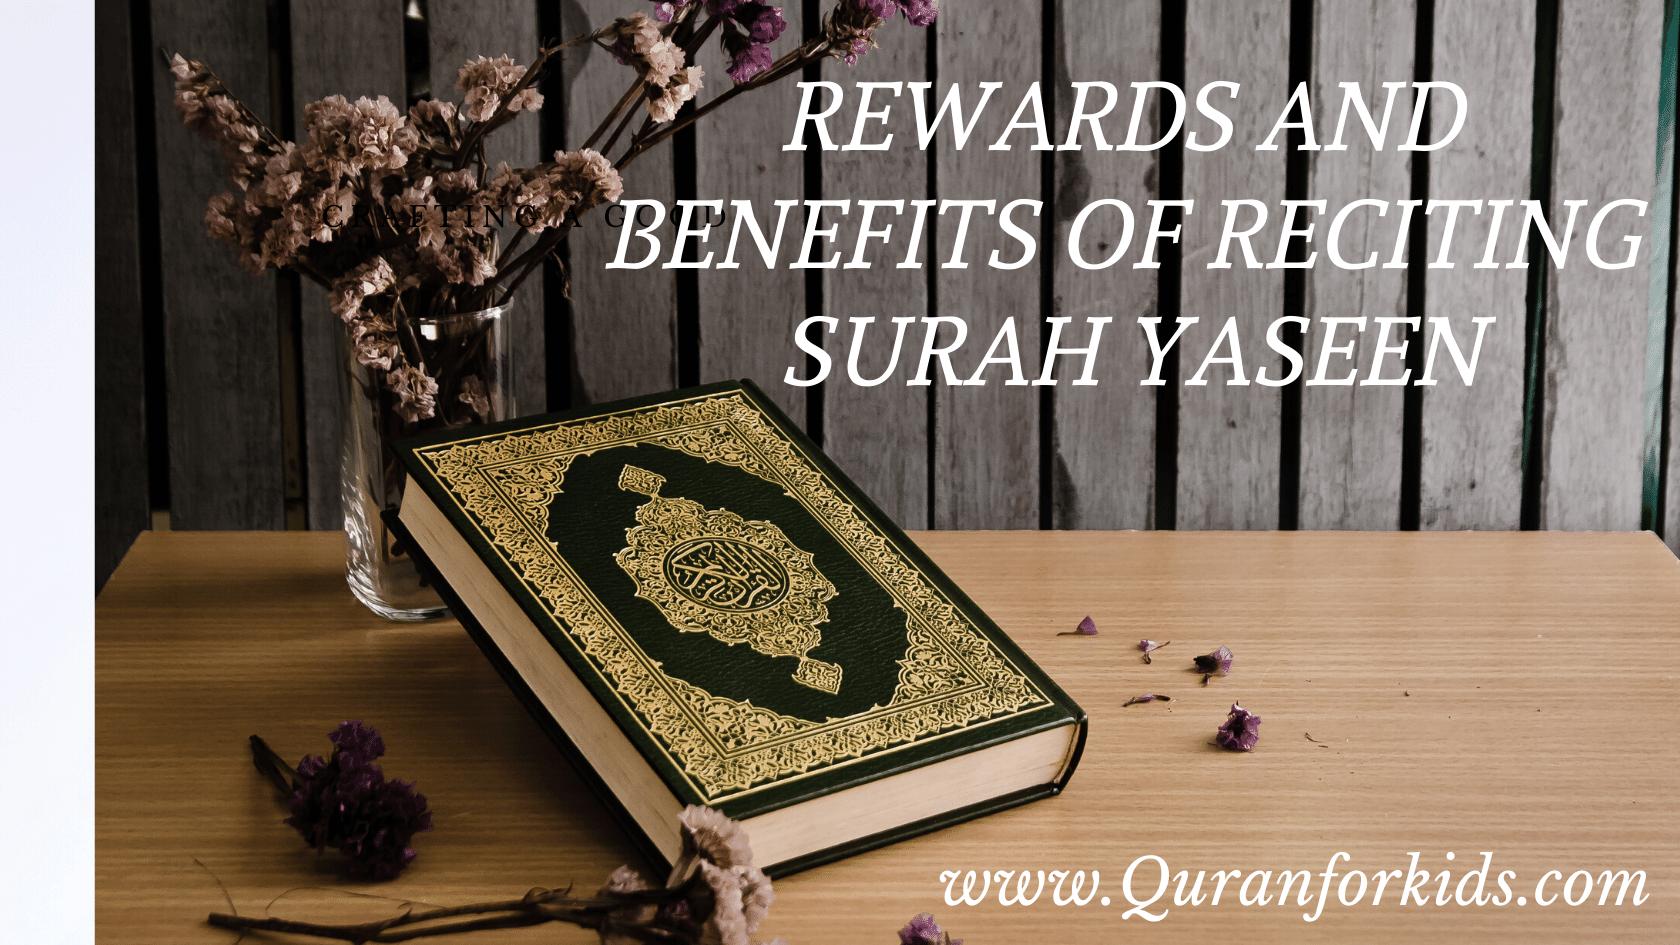 Rewards and Benefits of Reciting Surah Yaseen